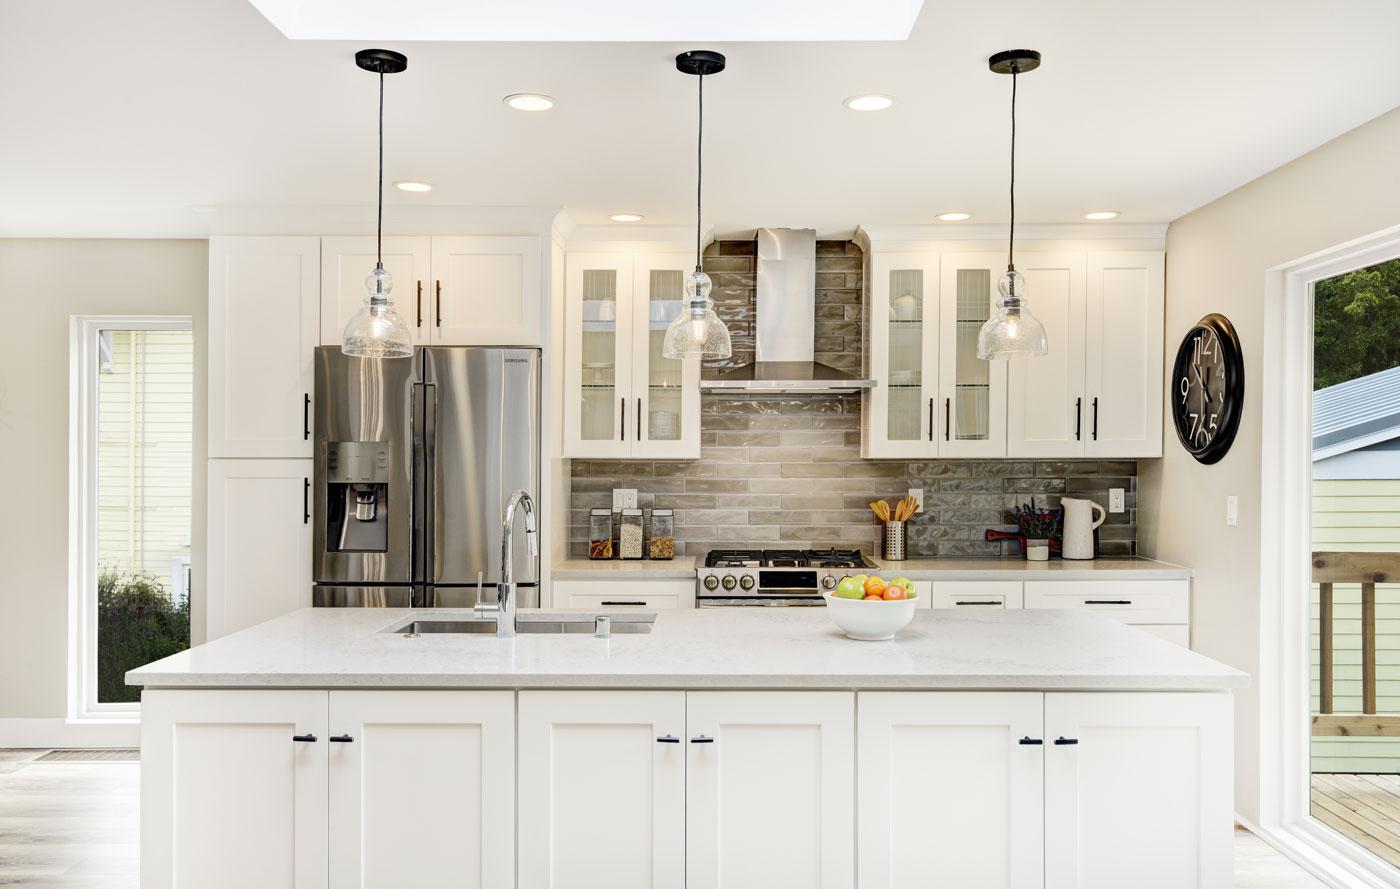 Ballard-Home-Remodel-Kitchen-Island.jpg